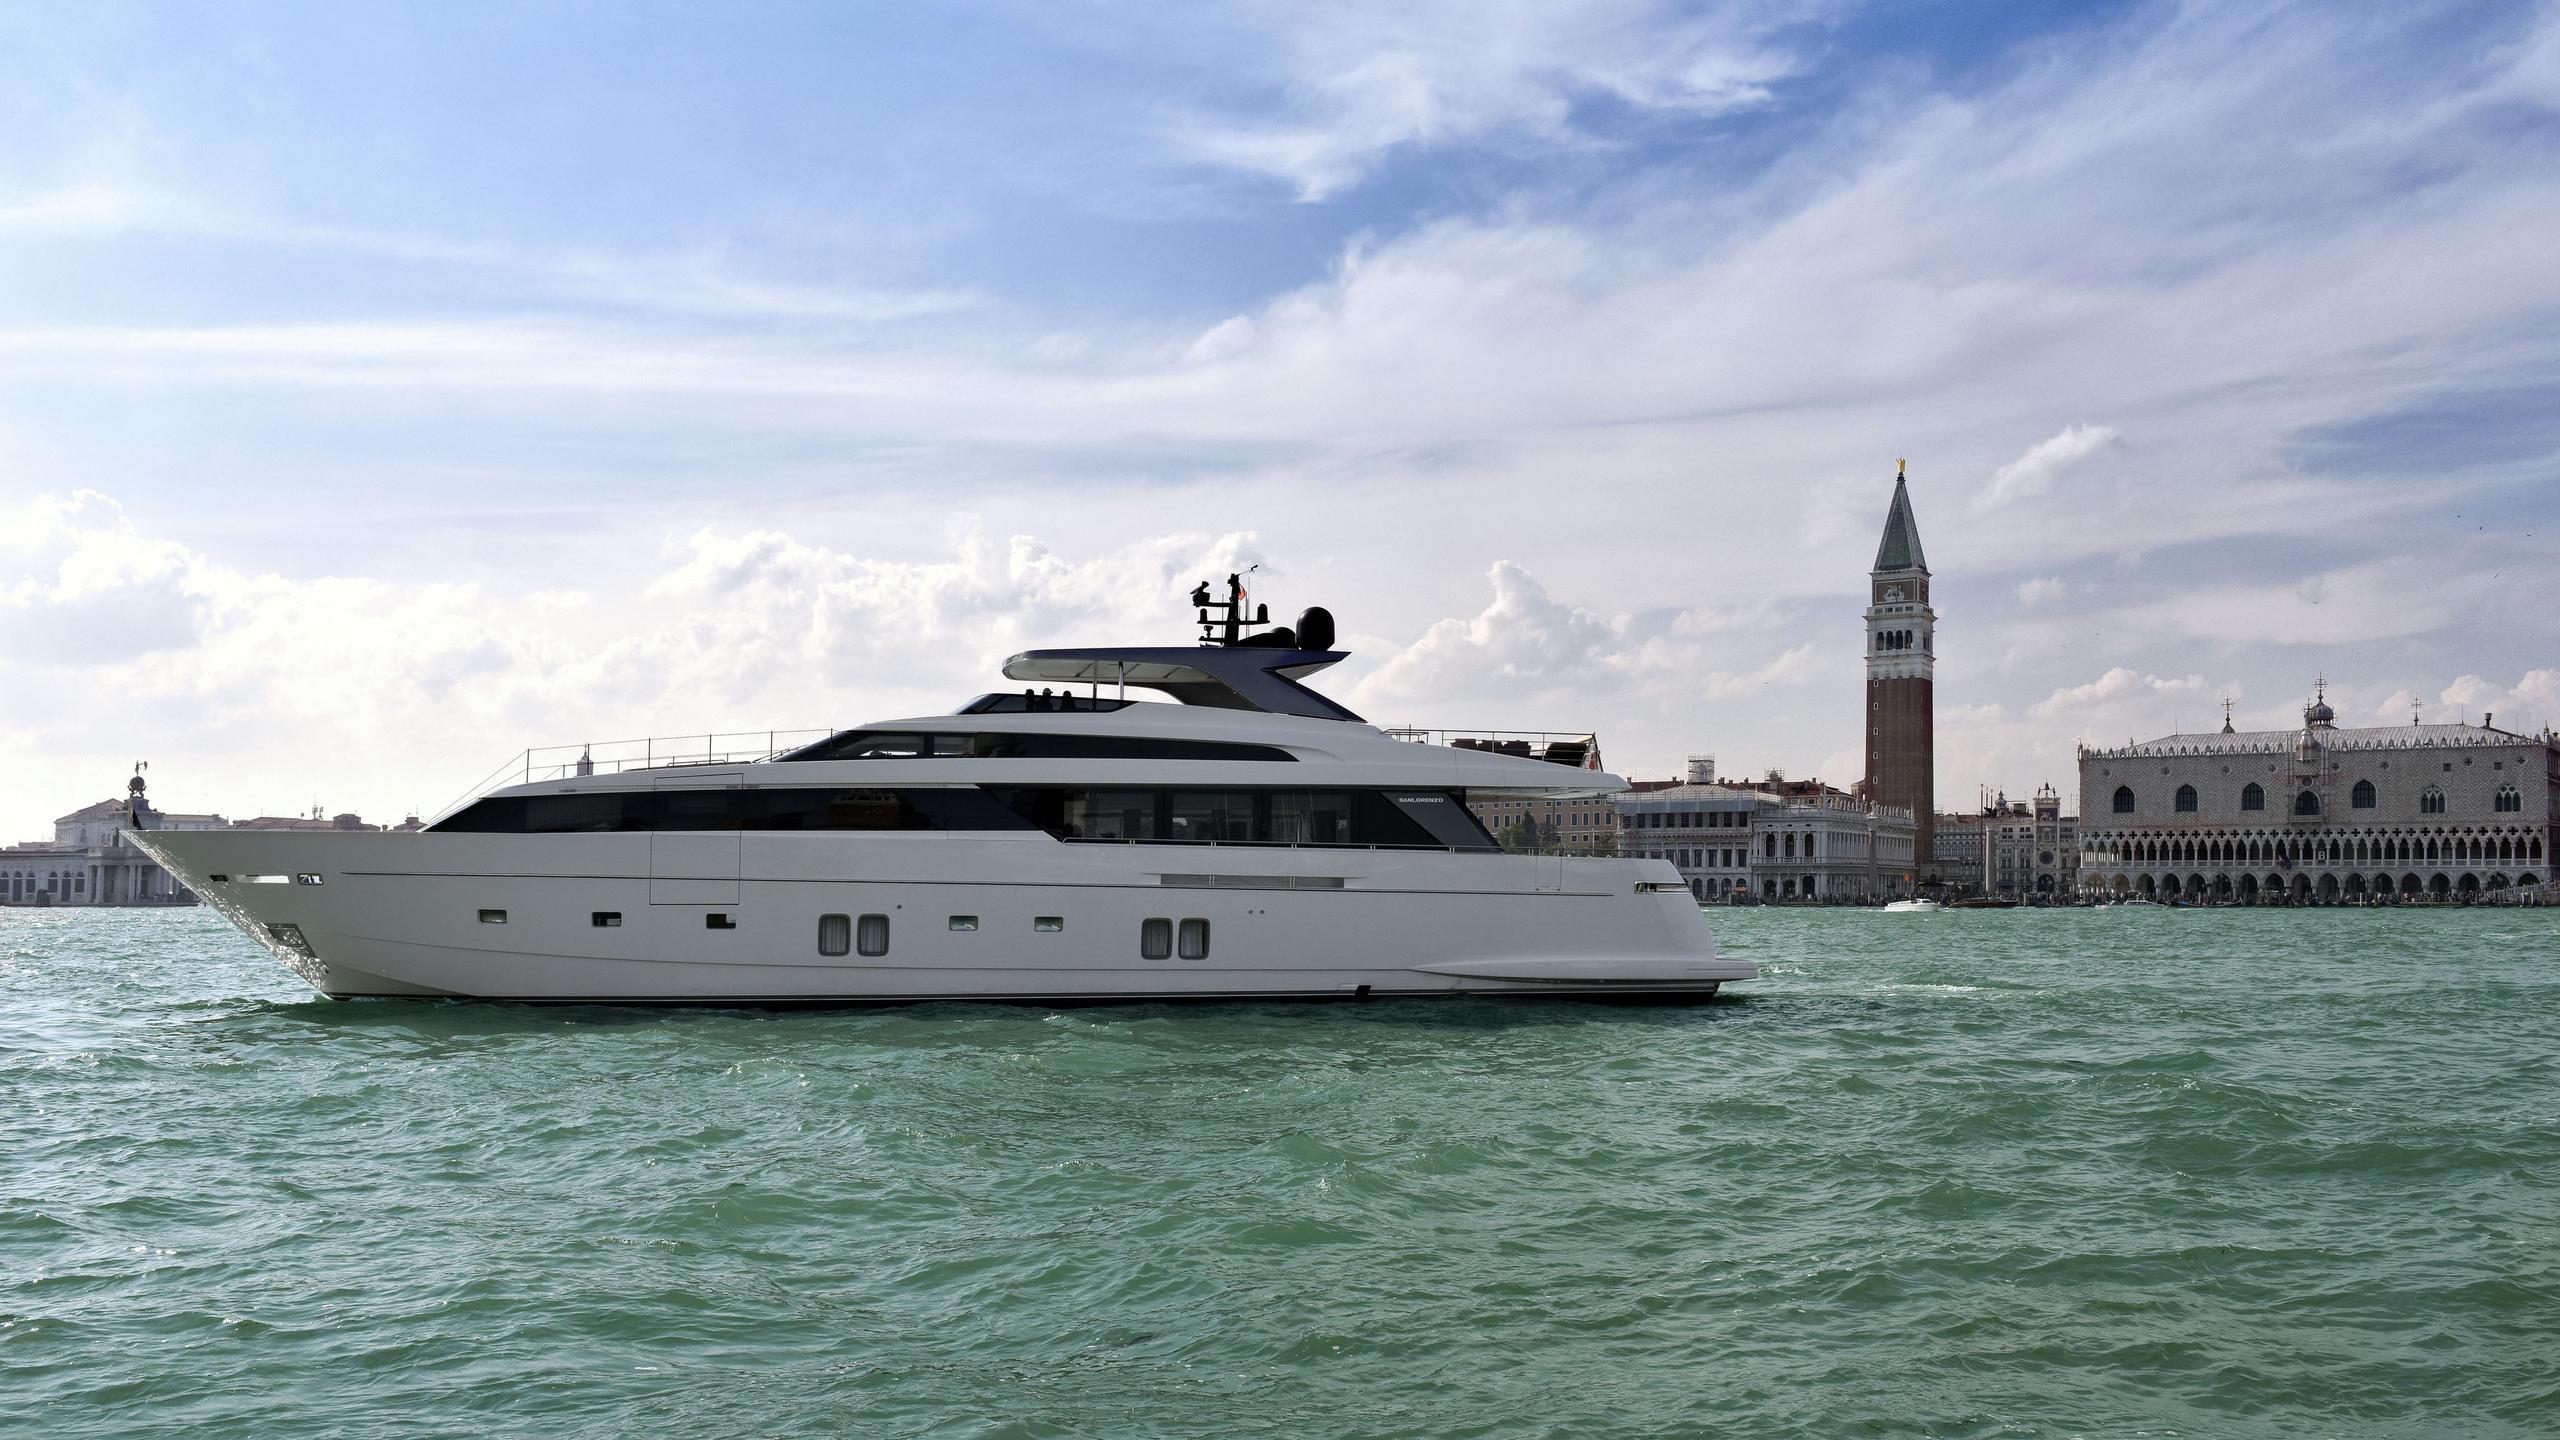 haiia motoryacht sanlorenzo sl118 36m 2015 profile